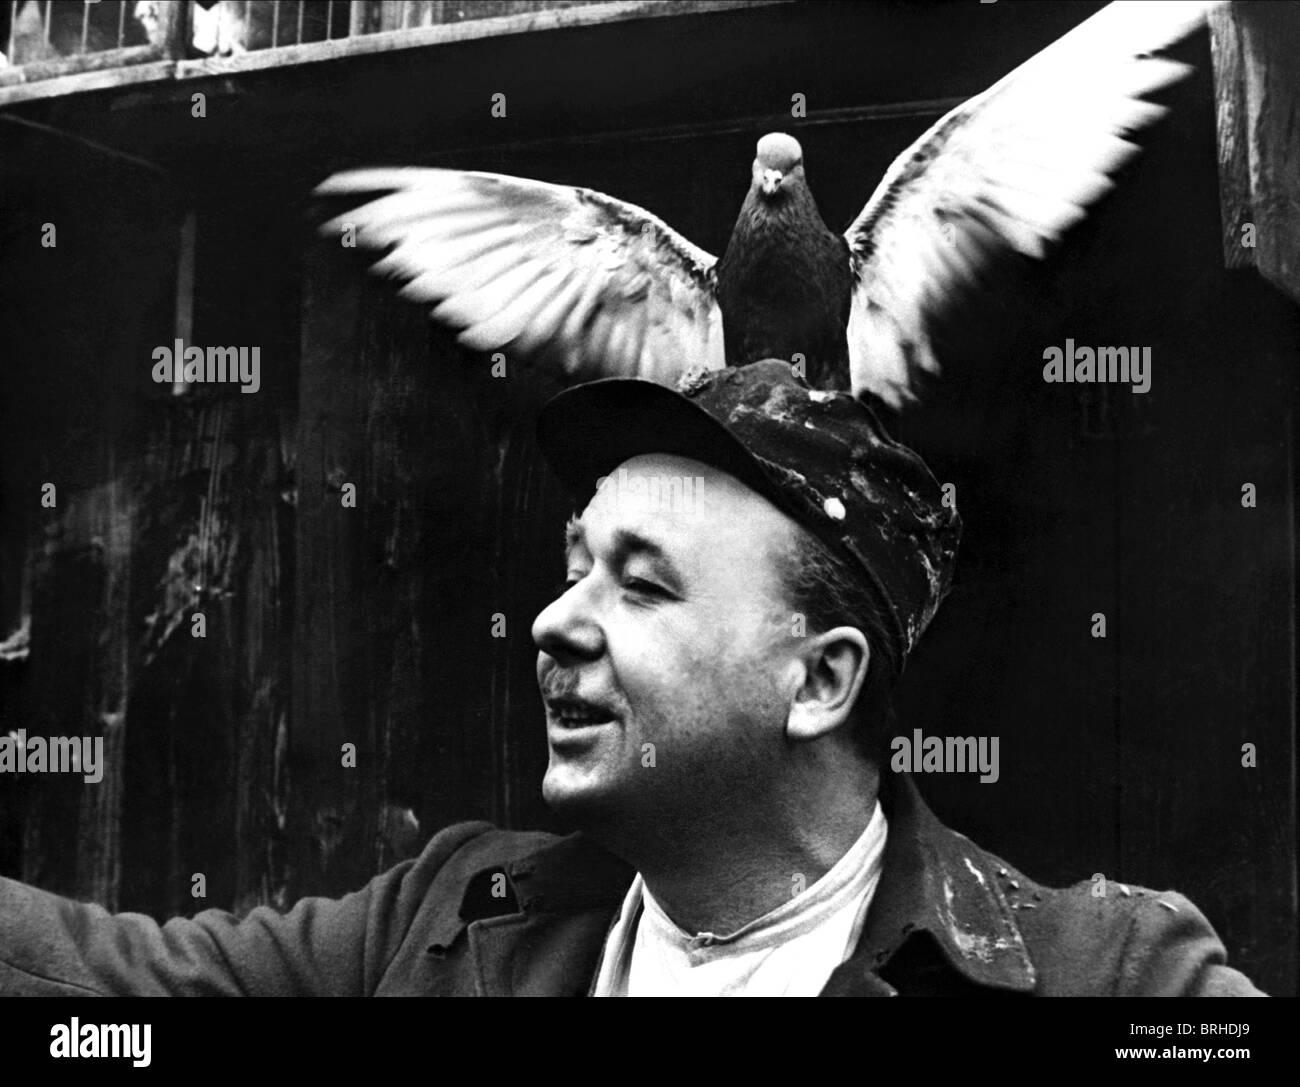 VLADIMIR VALENTA CLOSELY OBSERVED TRAINS (1966) - Stock Image